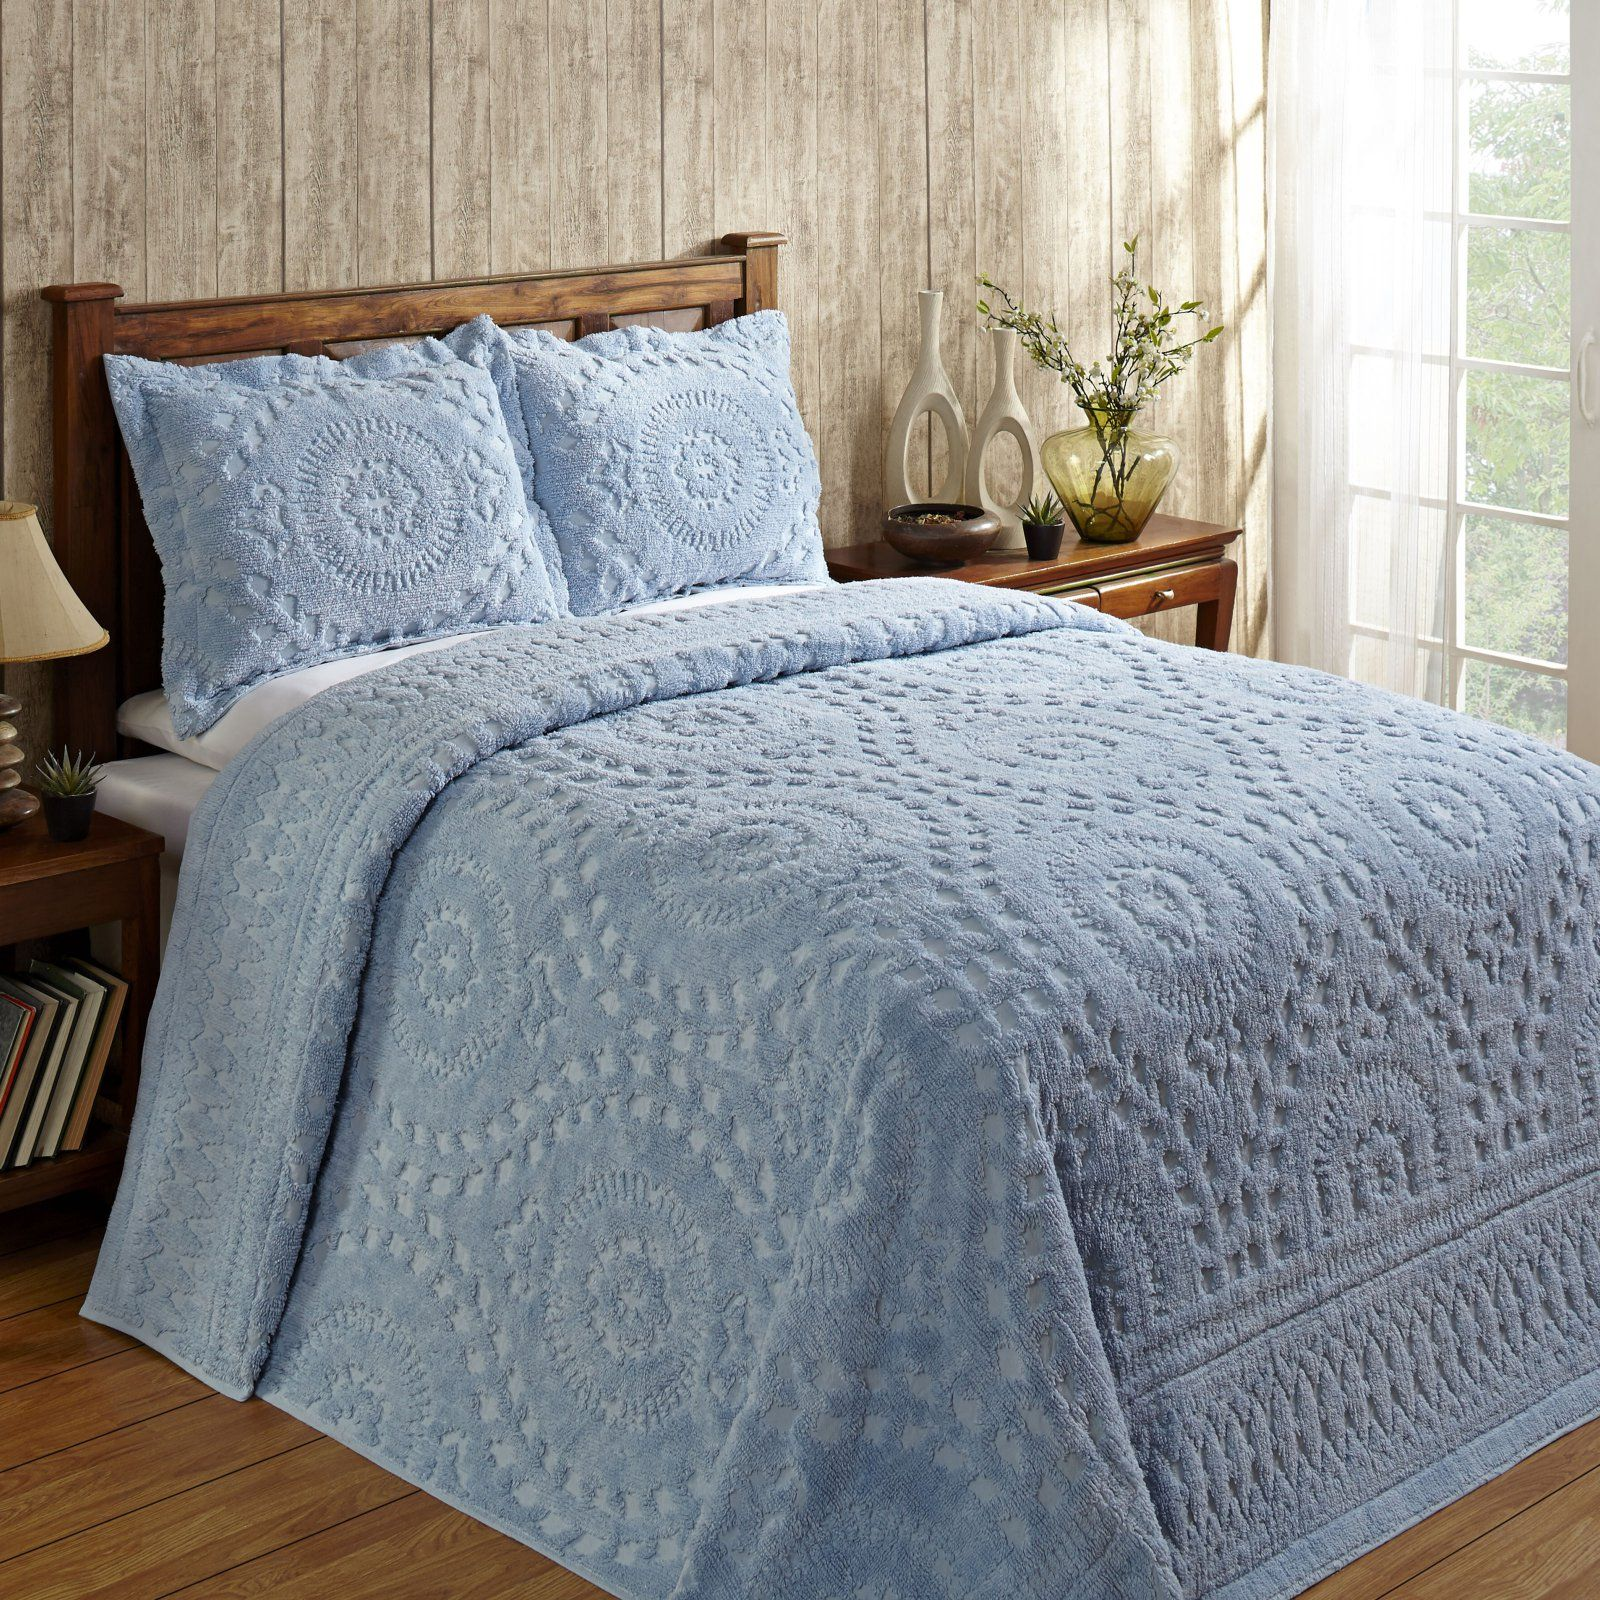 Rio Chenille Bedspread Queen 102x110 Blue Walmart Com Queen